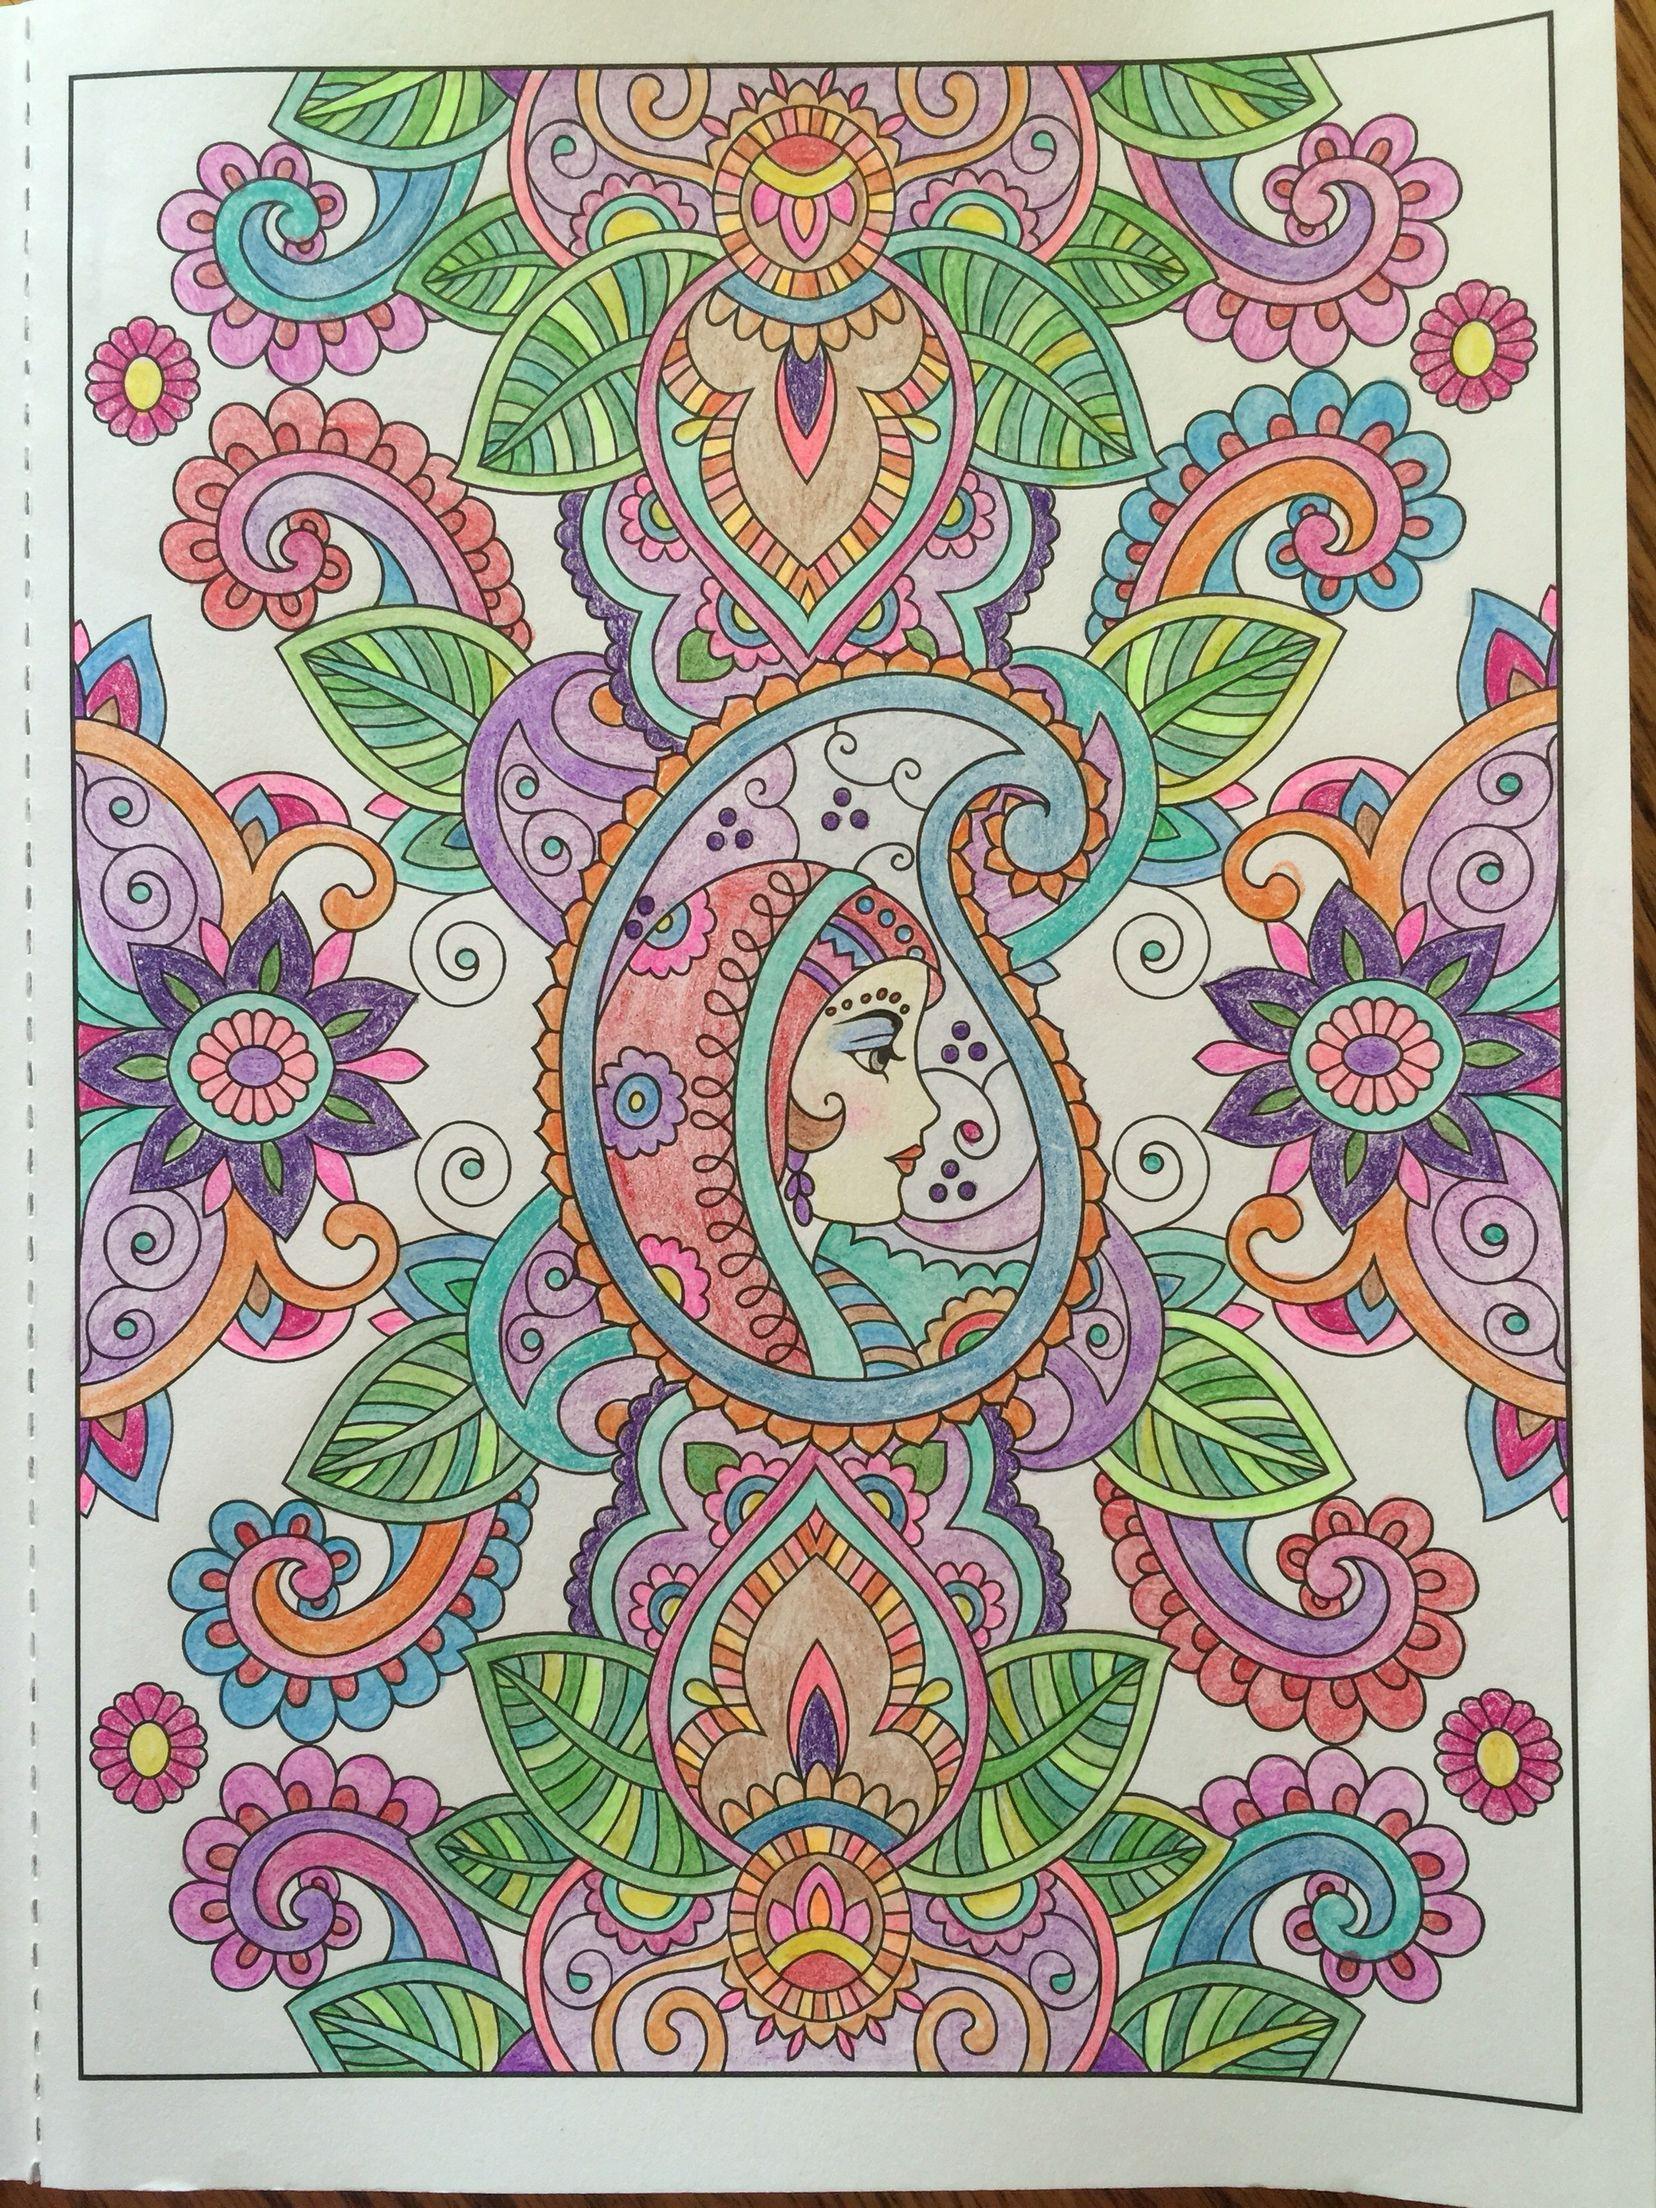 Mehndi Designs Traditional Henna Body Art By Marty Noble Mehndi